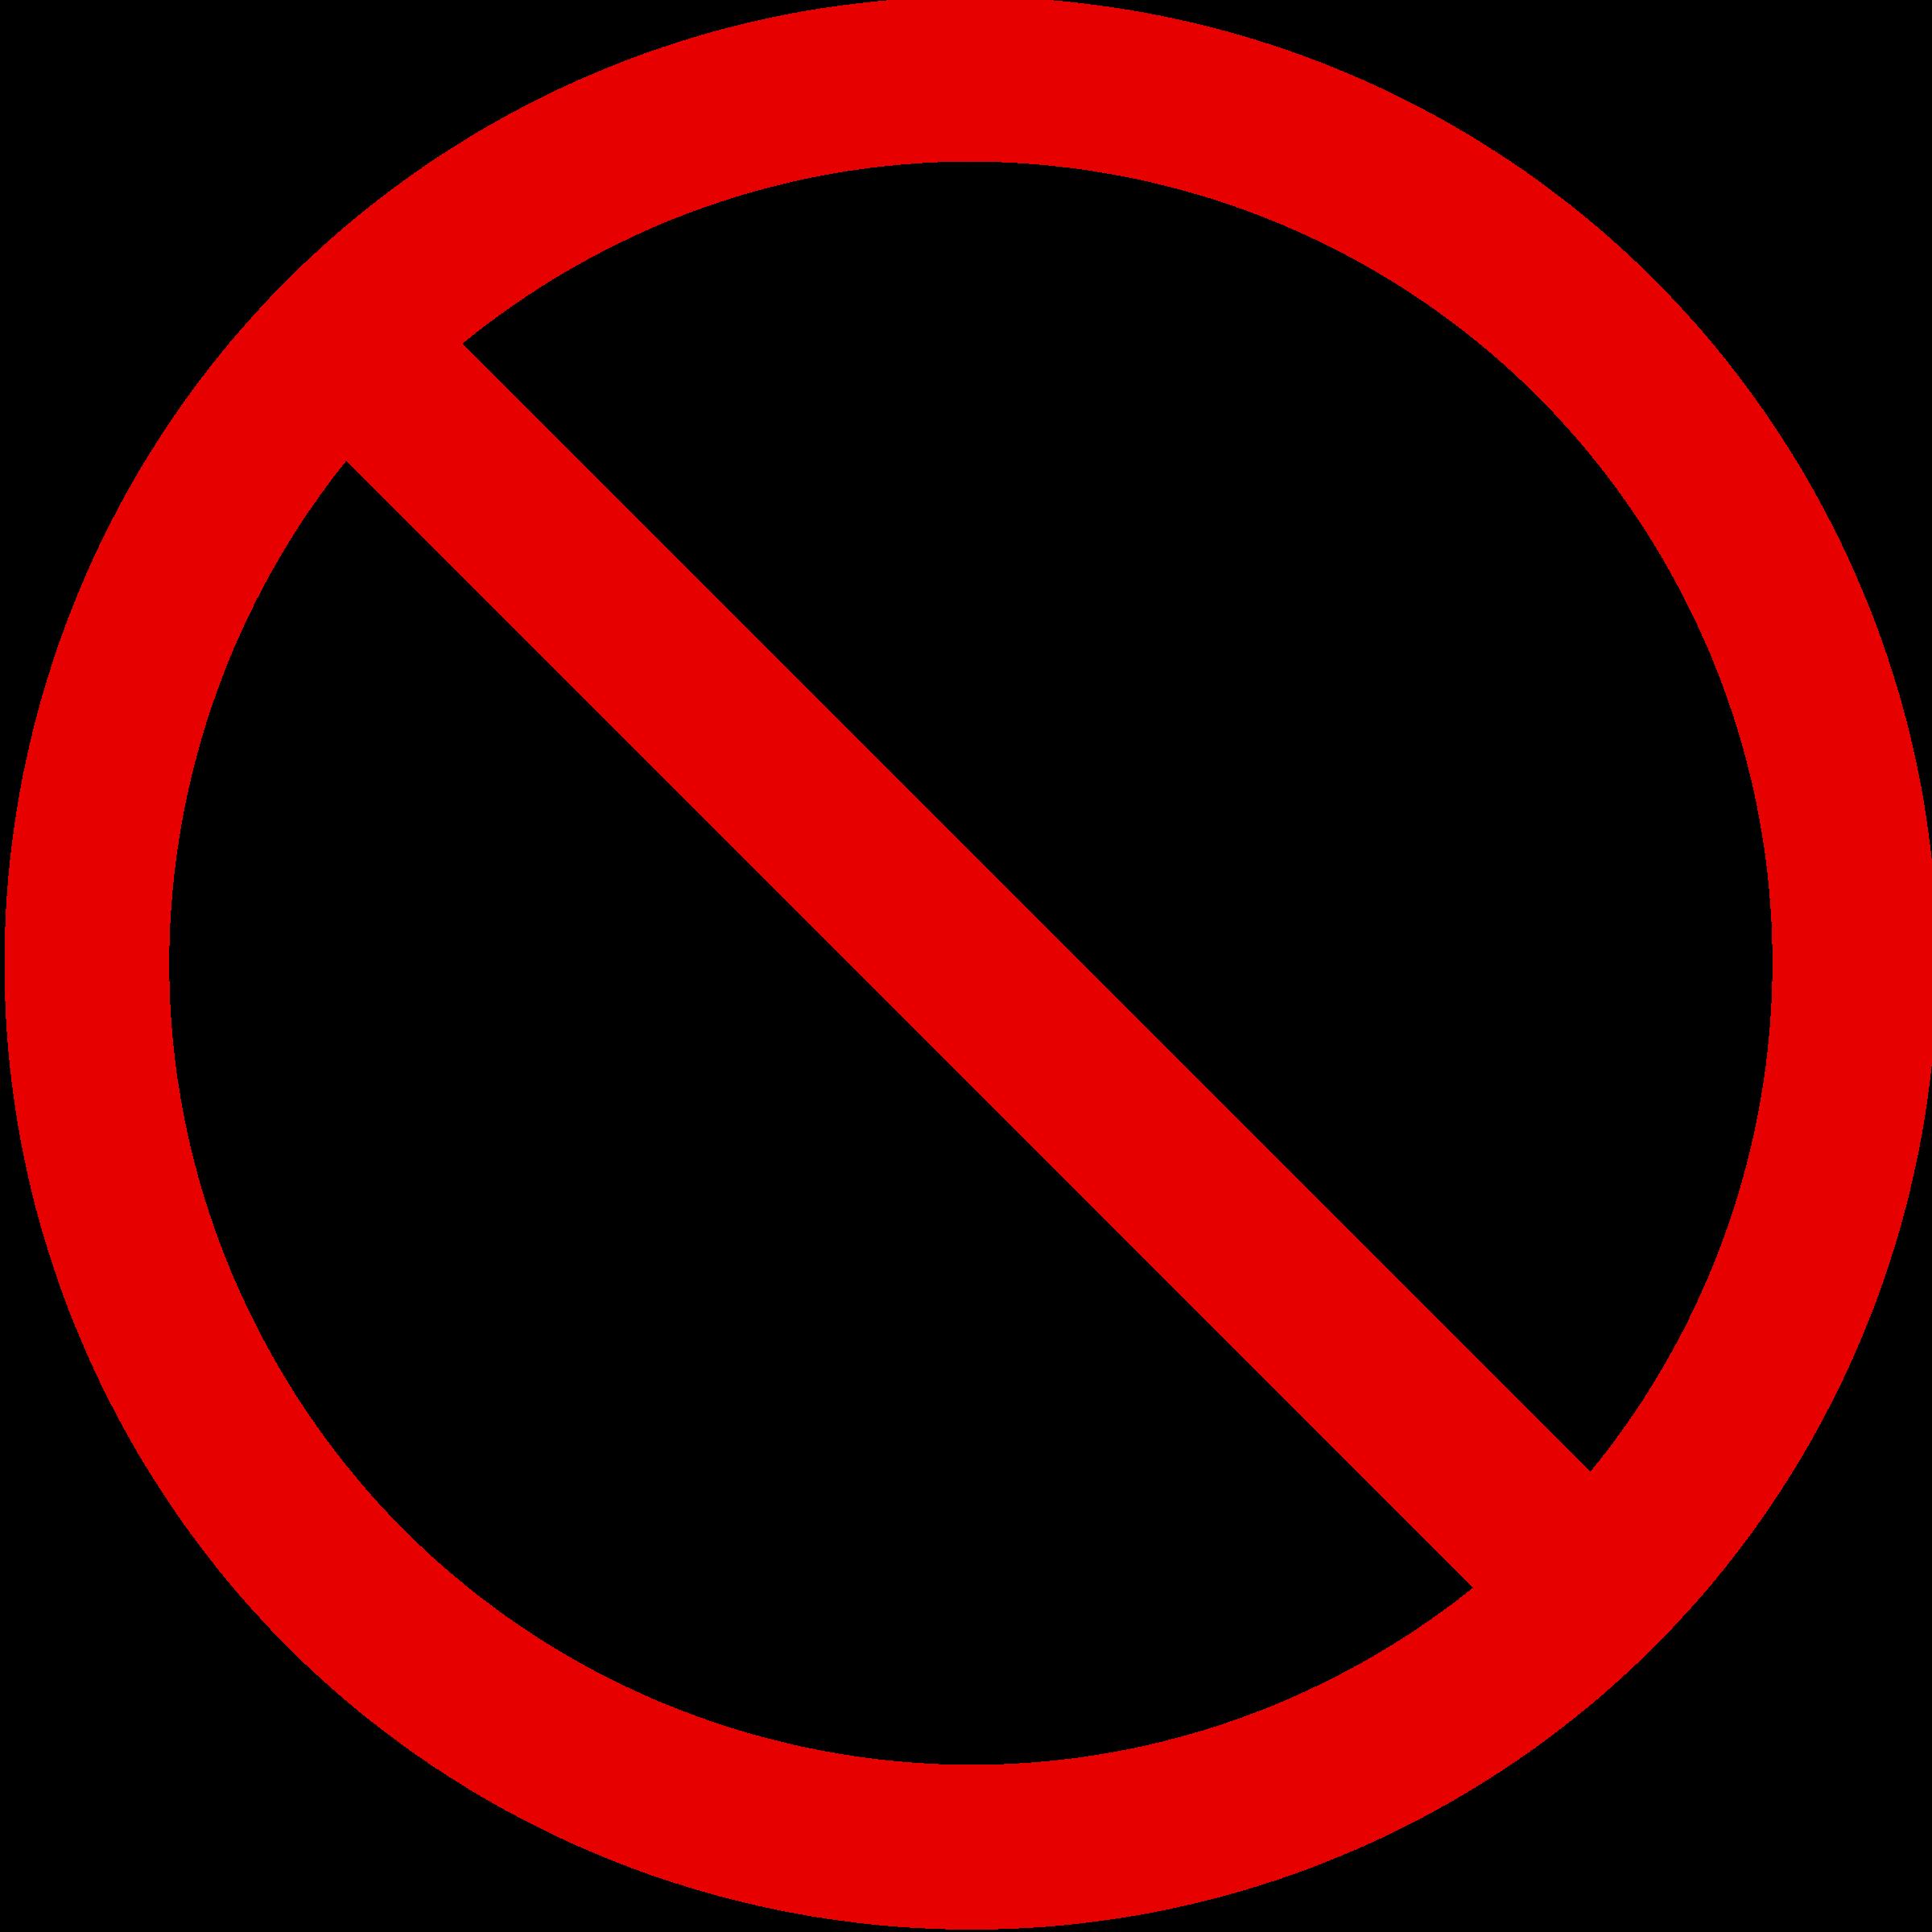 forbudsskilte logo